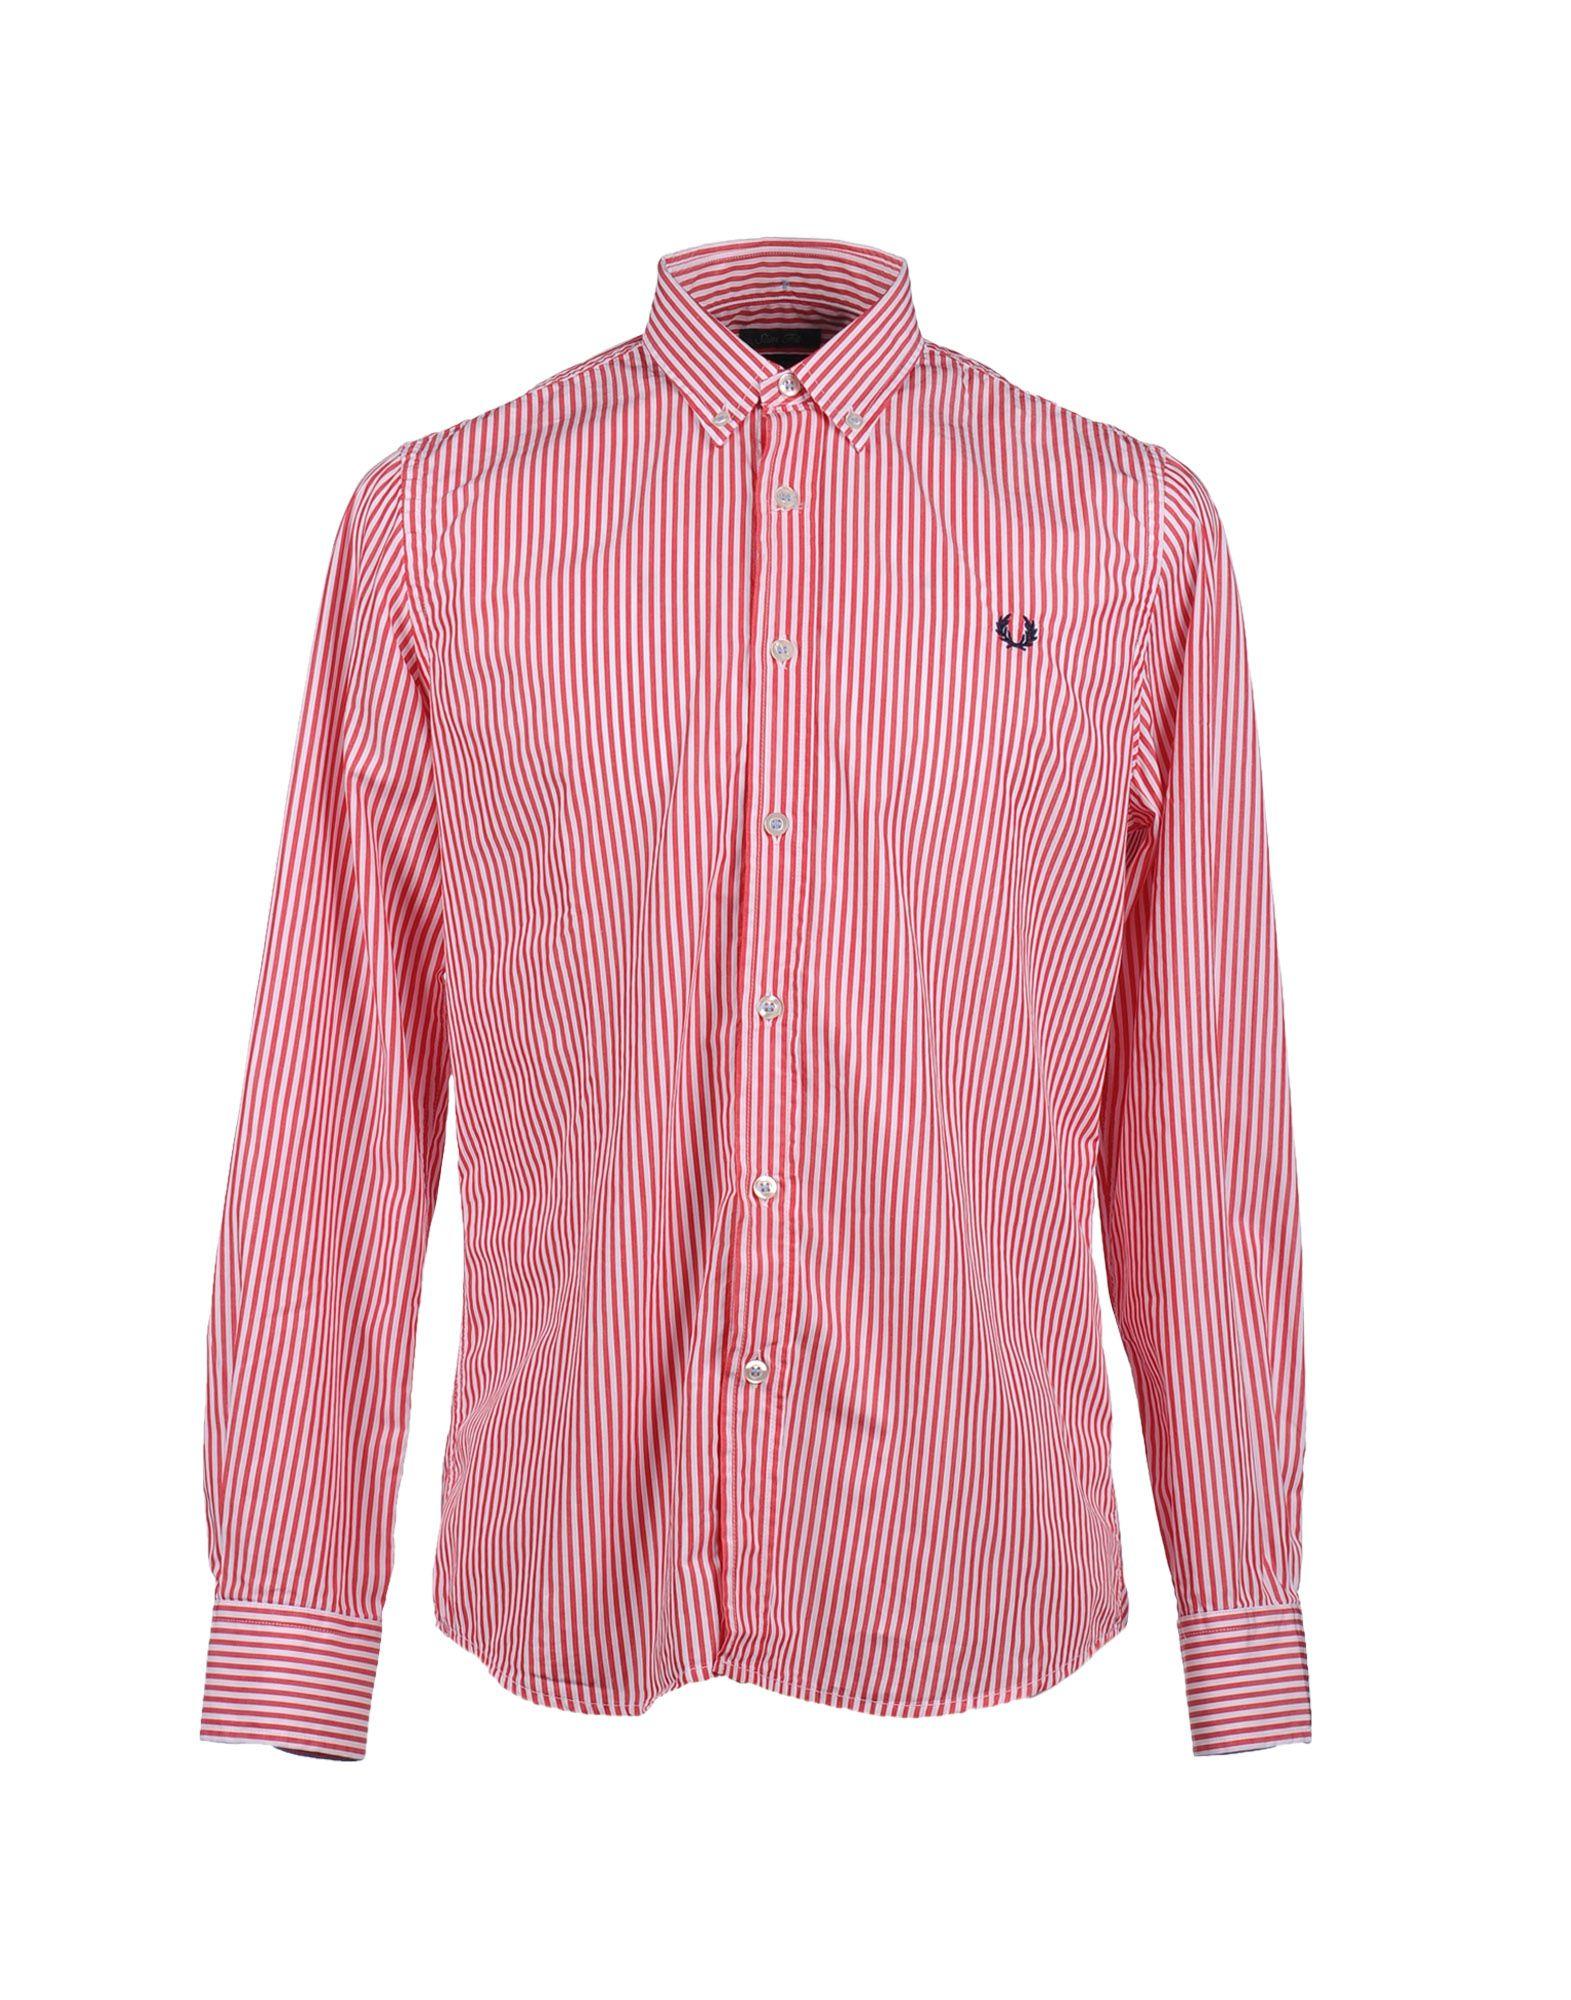 Фото - FRED PERRY Рубашка с длинными рукавами рубашка однотонная с длинными рукавами